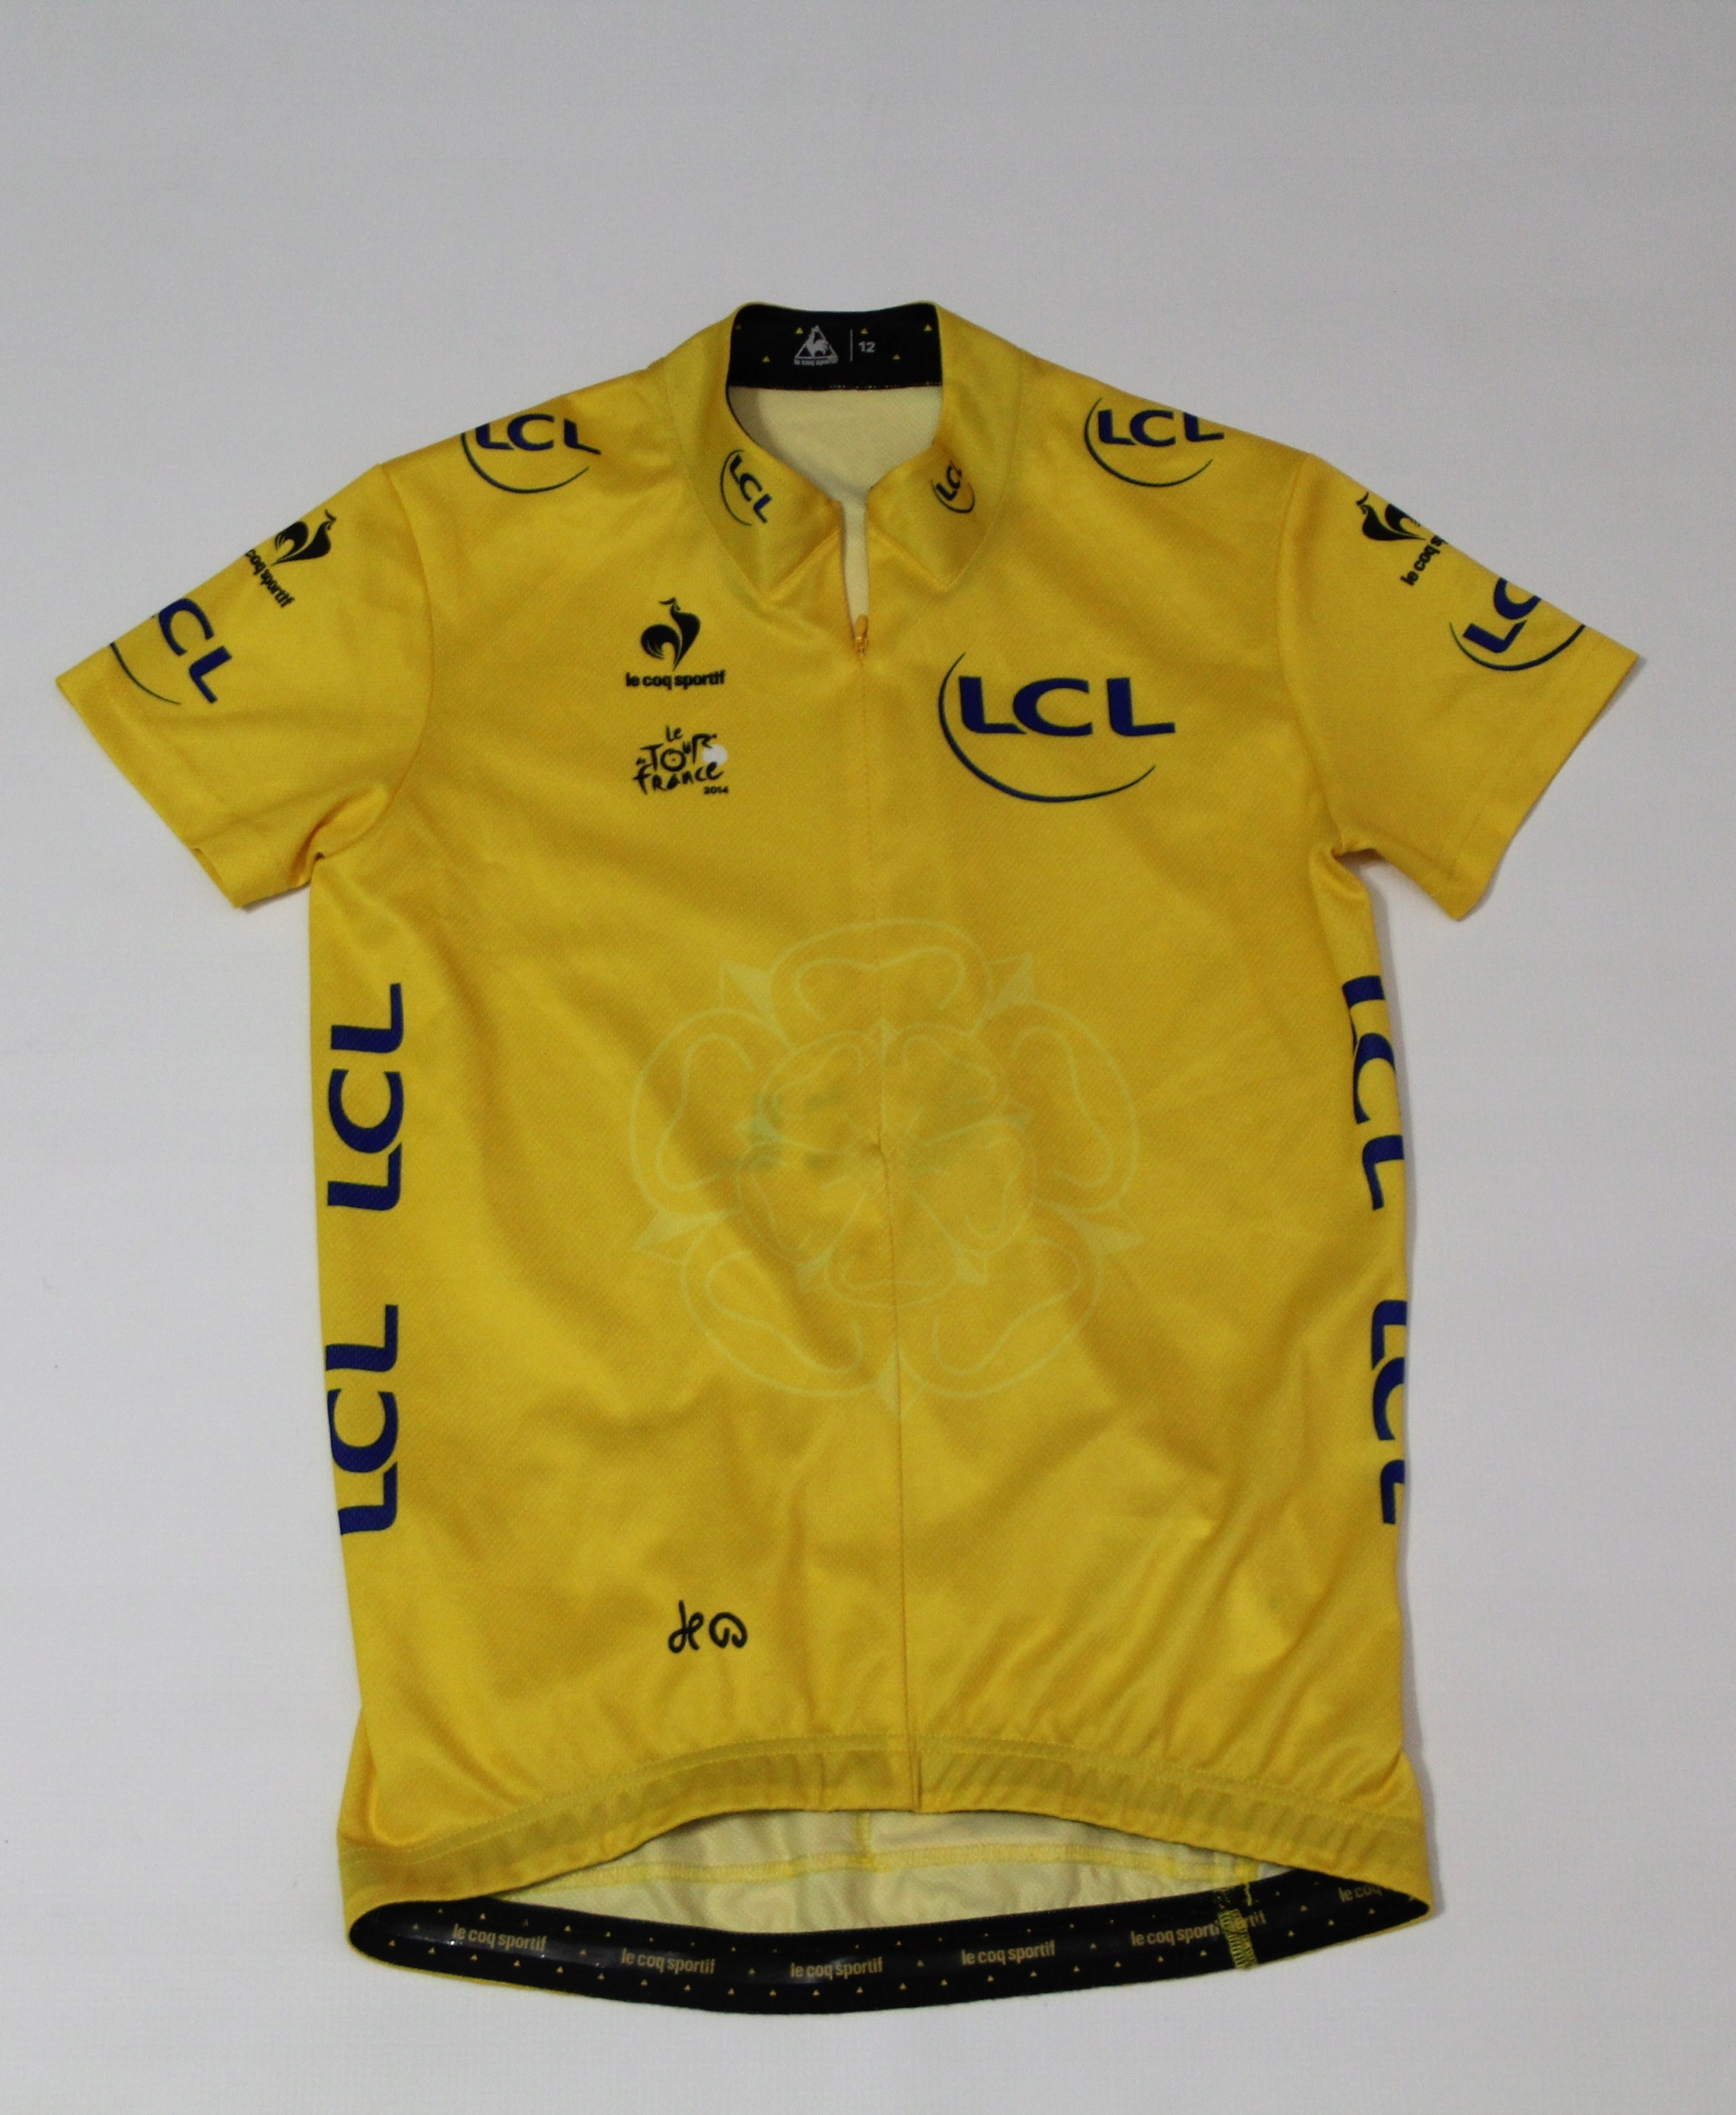 Koszulka Rowerowa Lee Coq Sportif Le Tour France